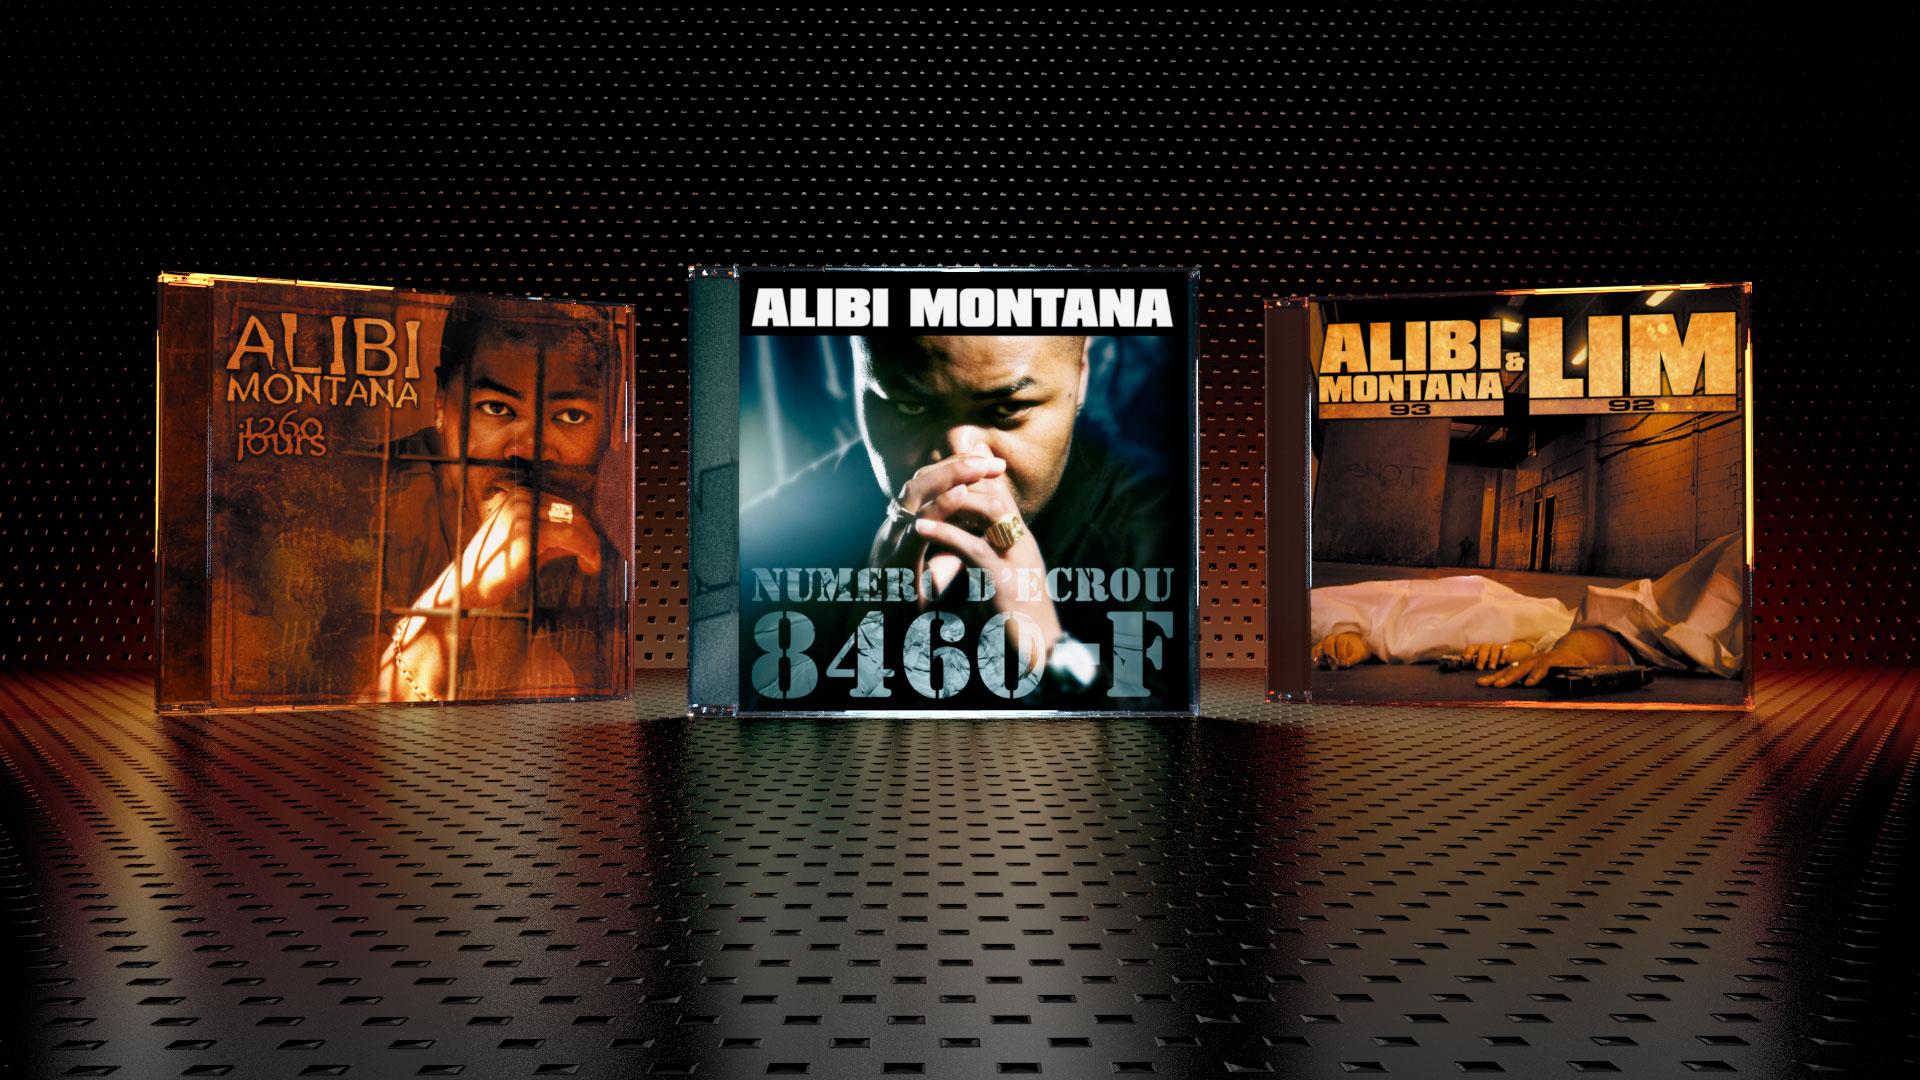 Photos and Sleeve Album design for Alibi Montana, and LIM : 1260 Jours, Numéro d'écrou, Rue.